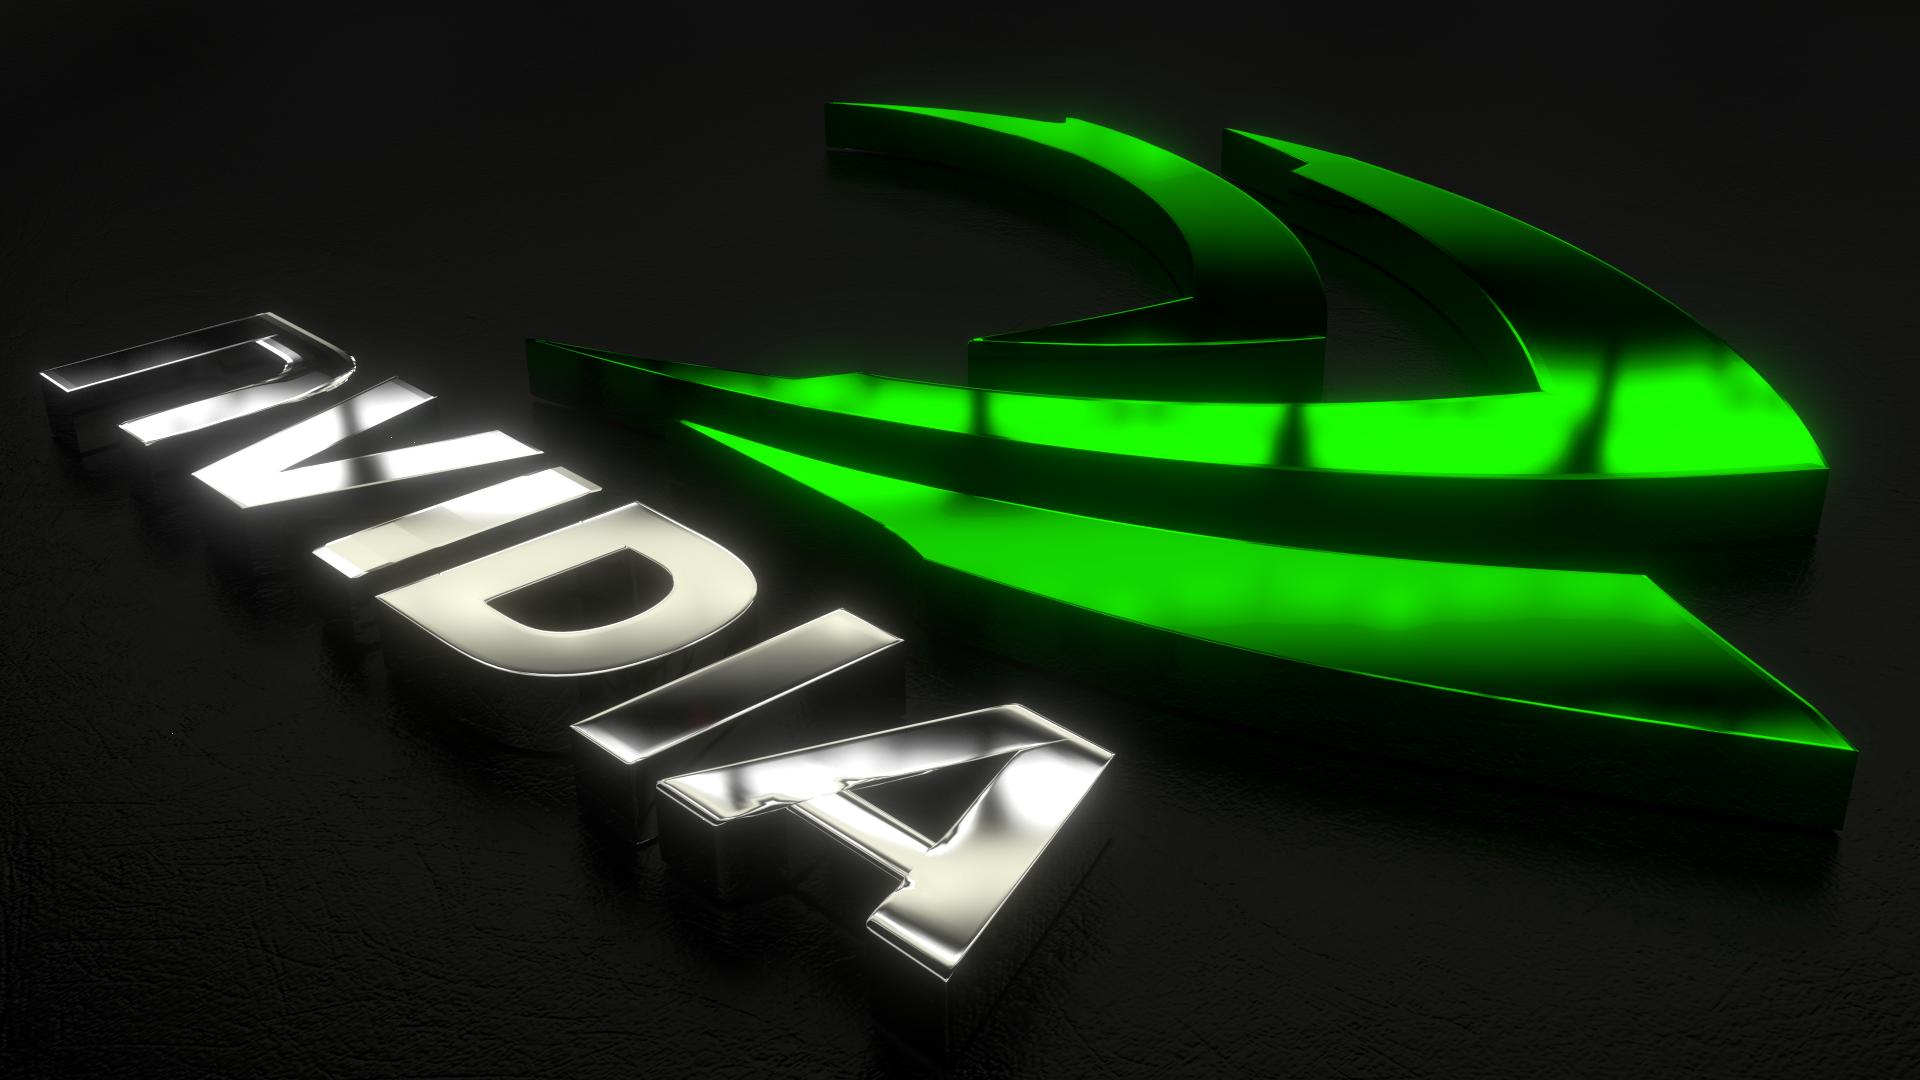 Nvidia after the fall nvidia corporation nasdaqnvda seeking pronounced drop and volatility stopboris Image collections